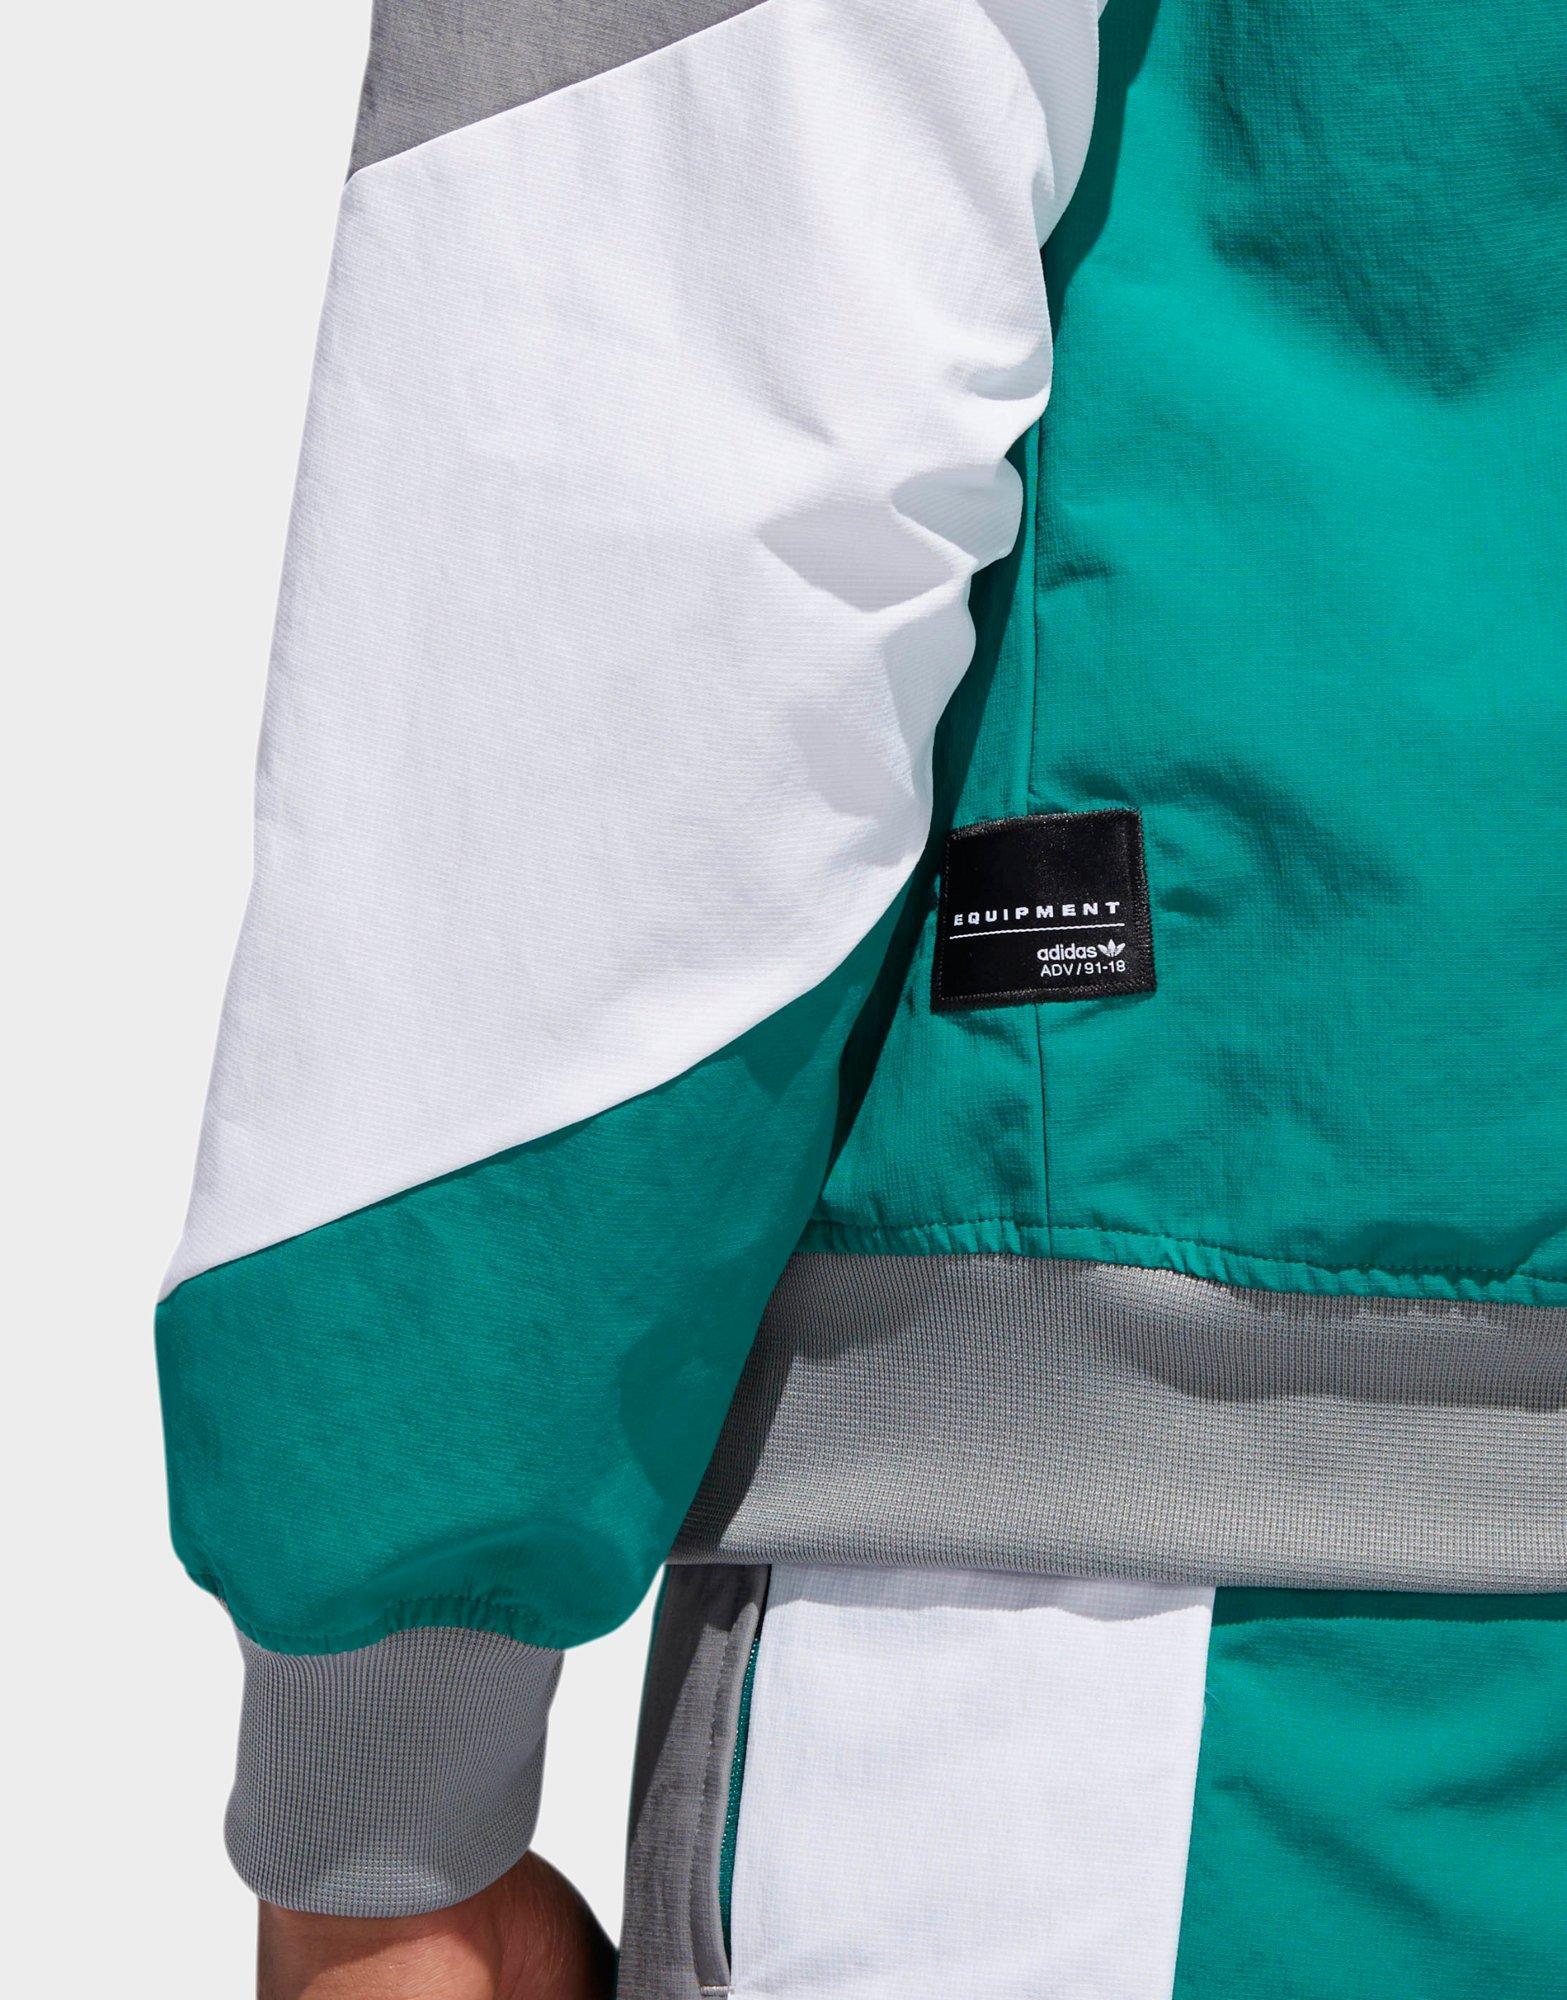 adidas equipment jacket green